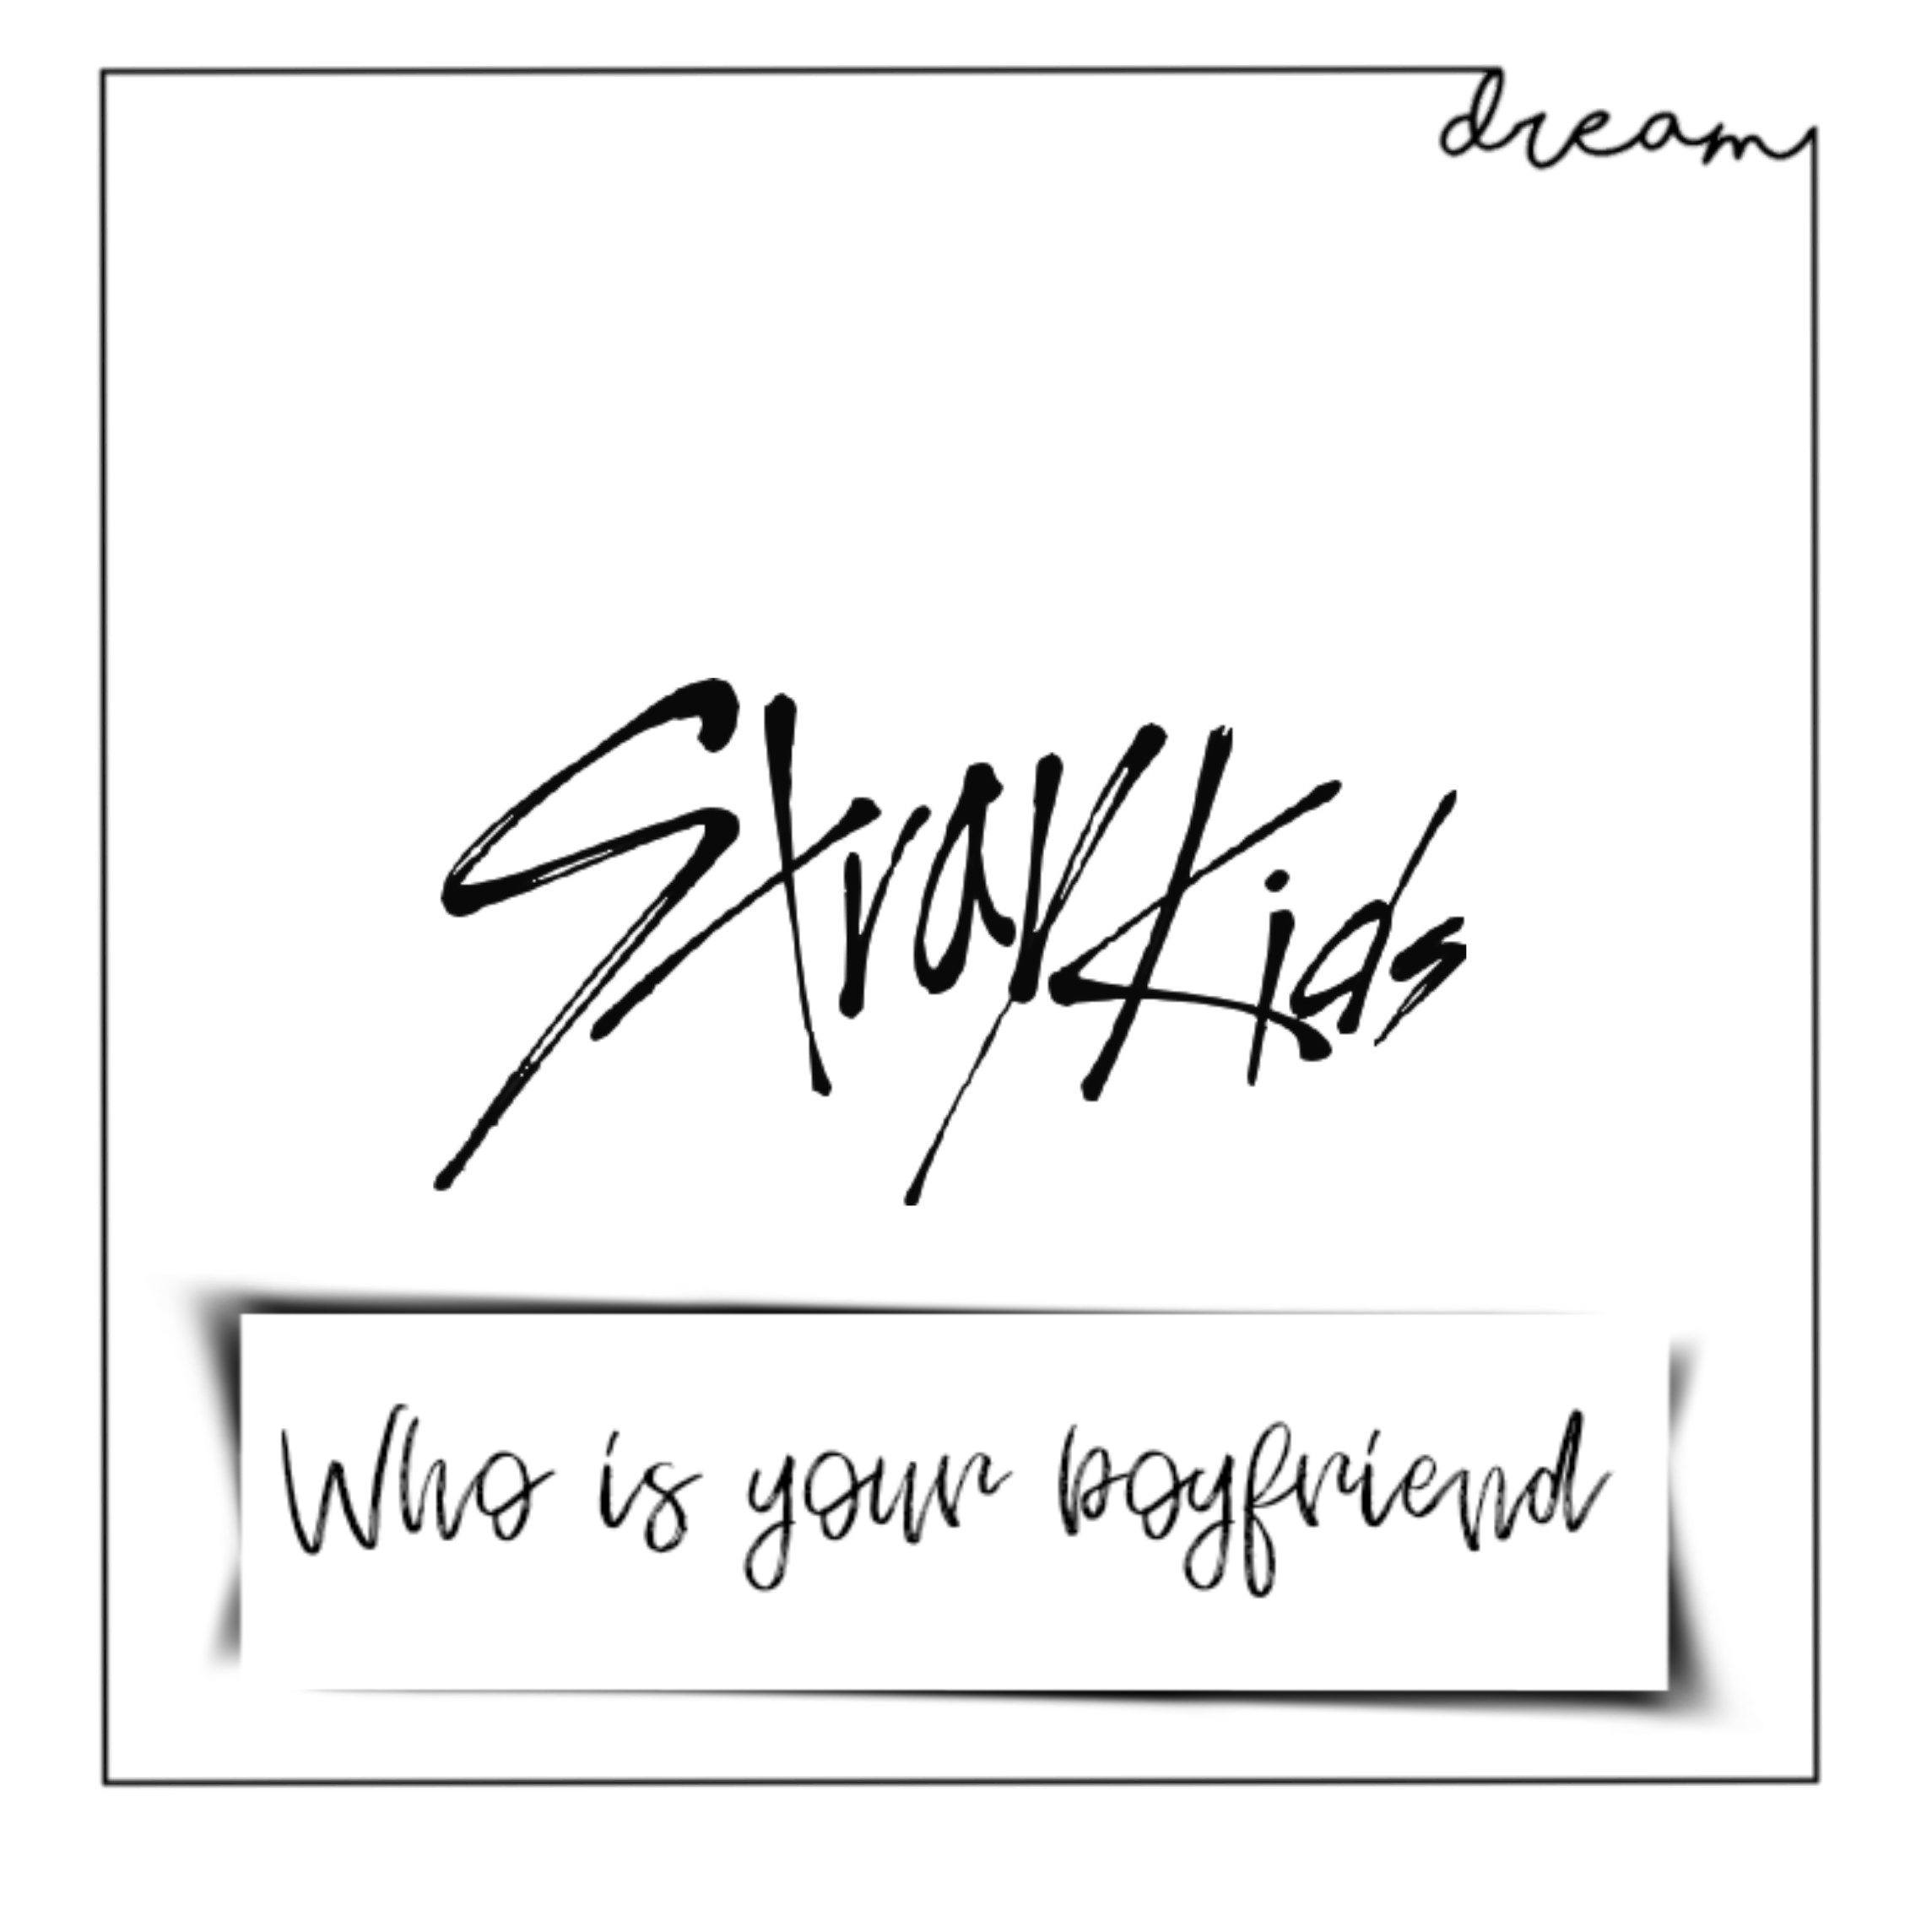 straykids stay stray kids kpop - Image by Nanuki 🍦